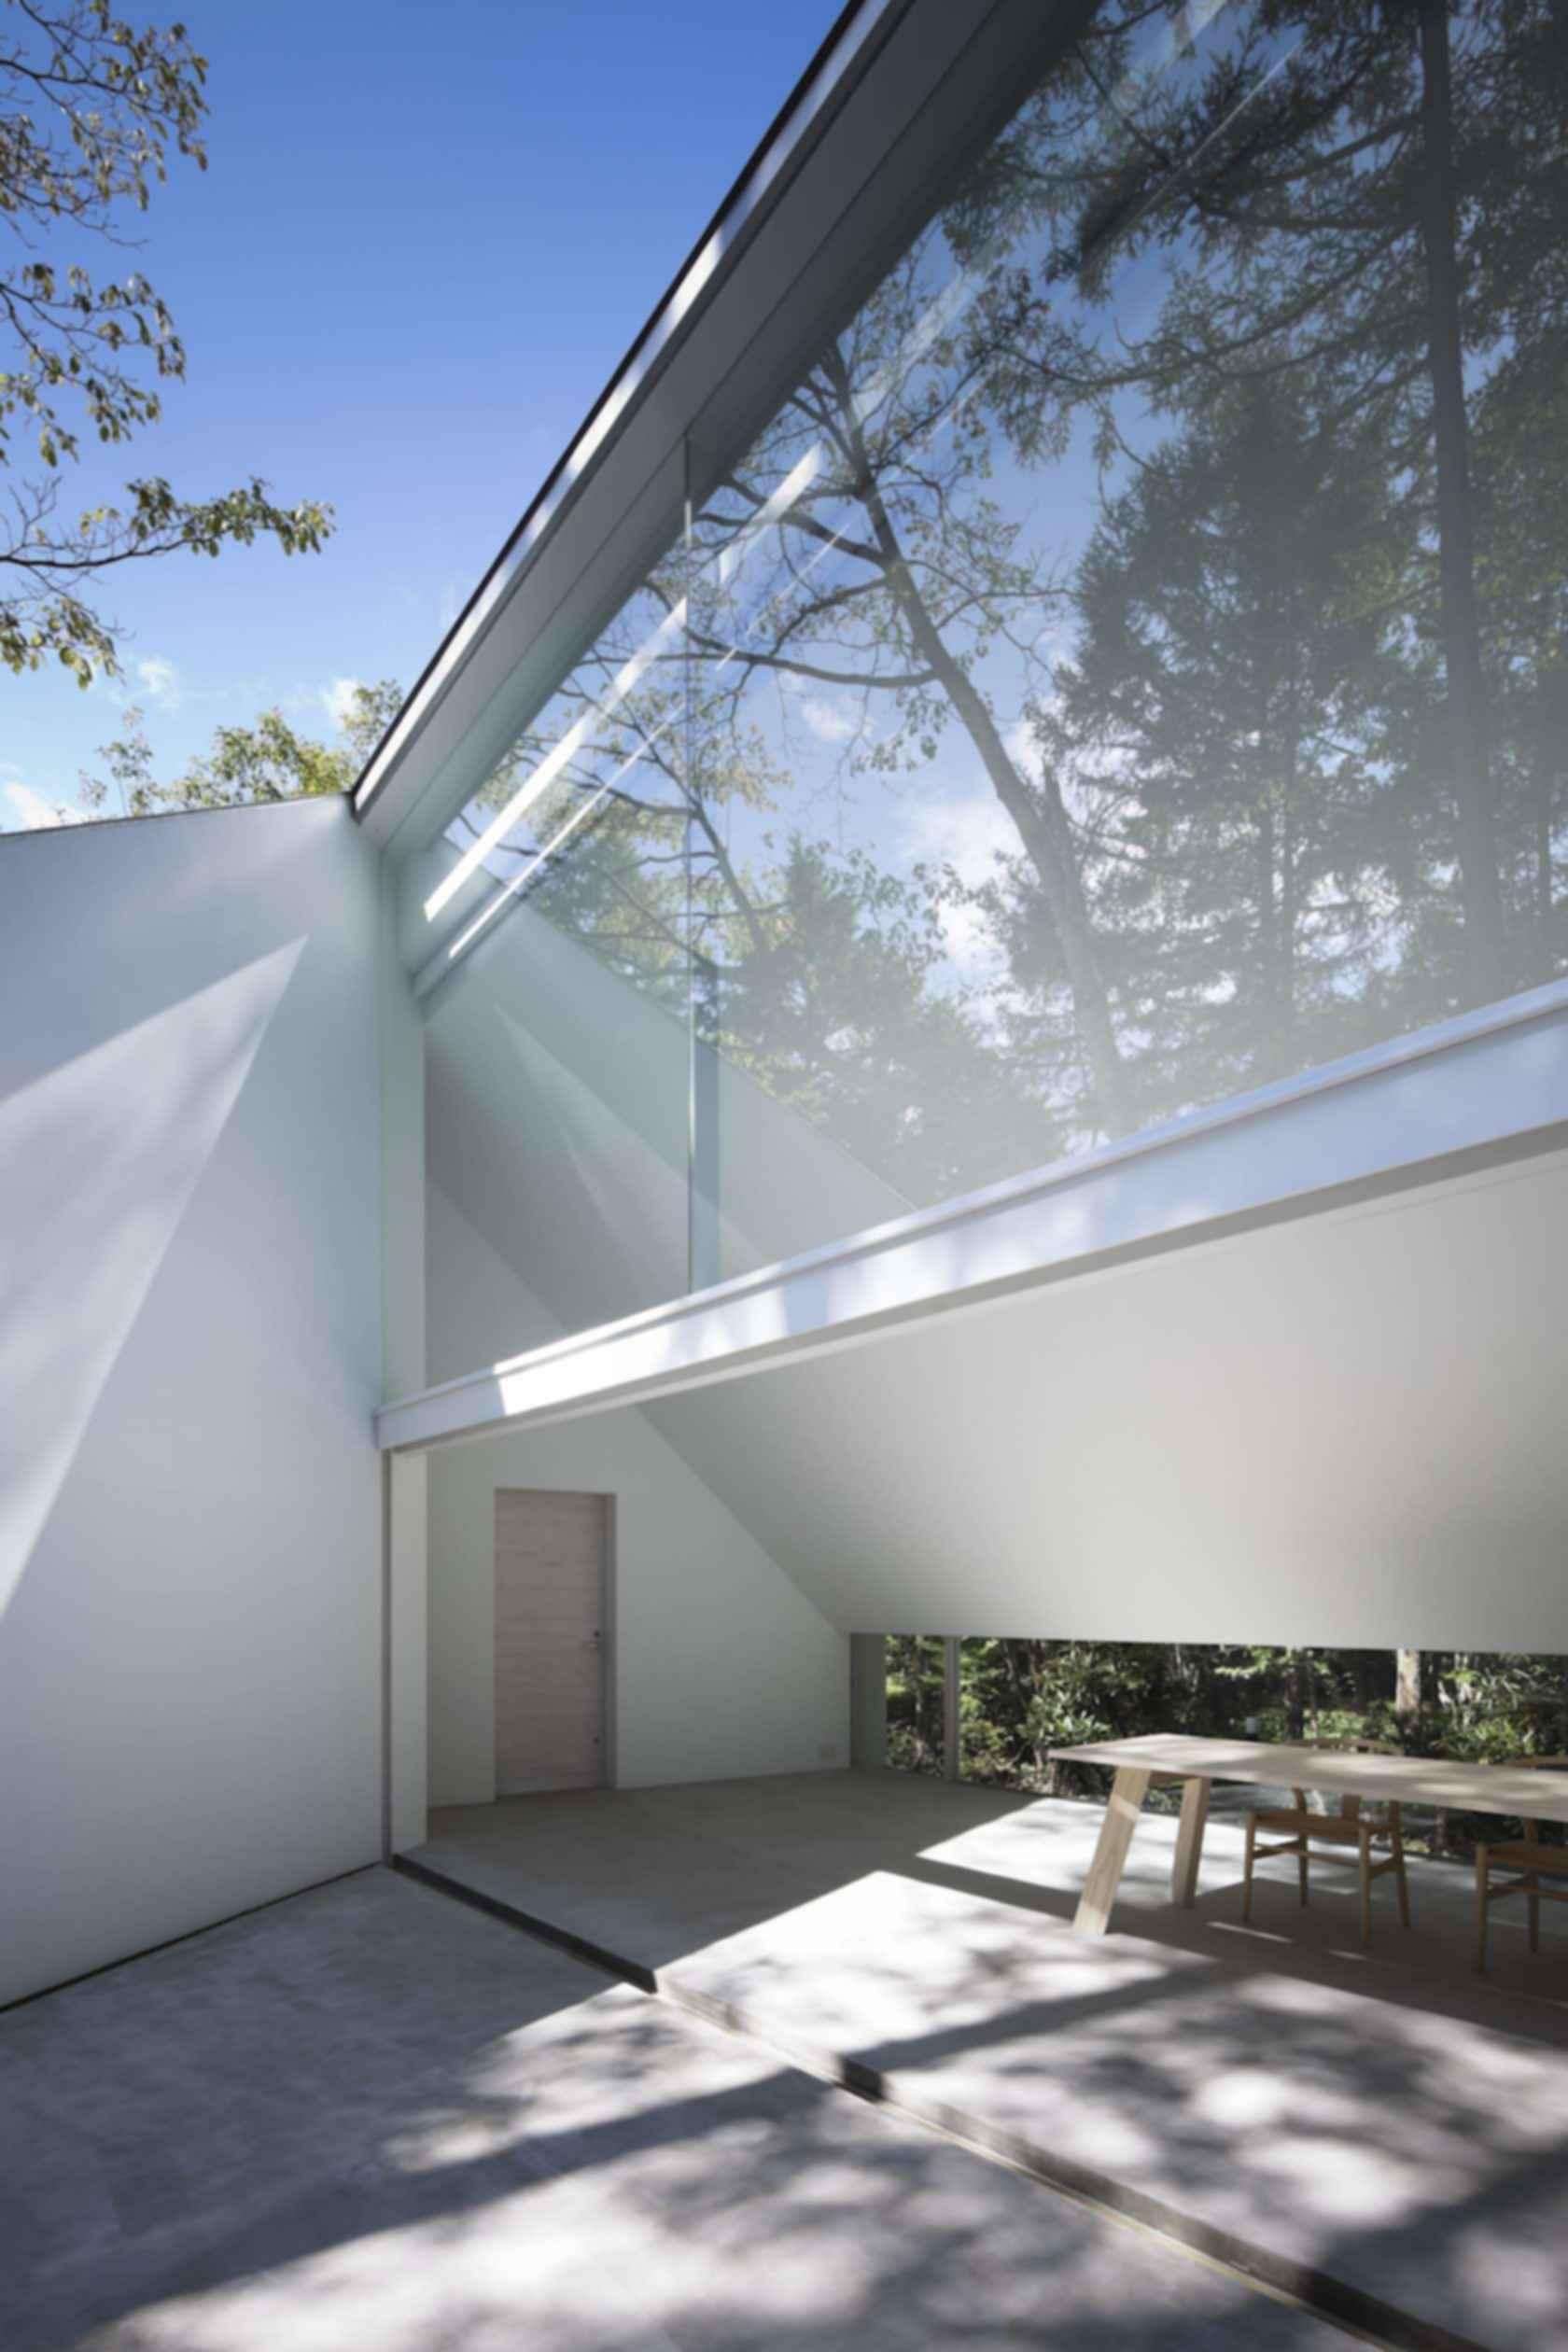 Forest Bath House - Exterior/Interior